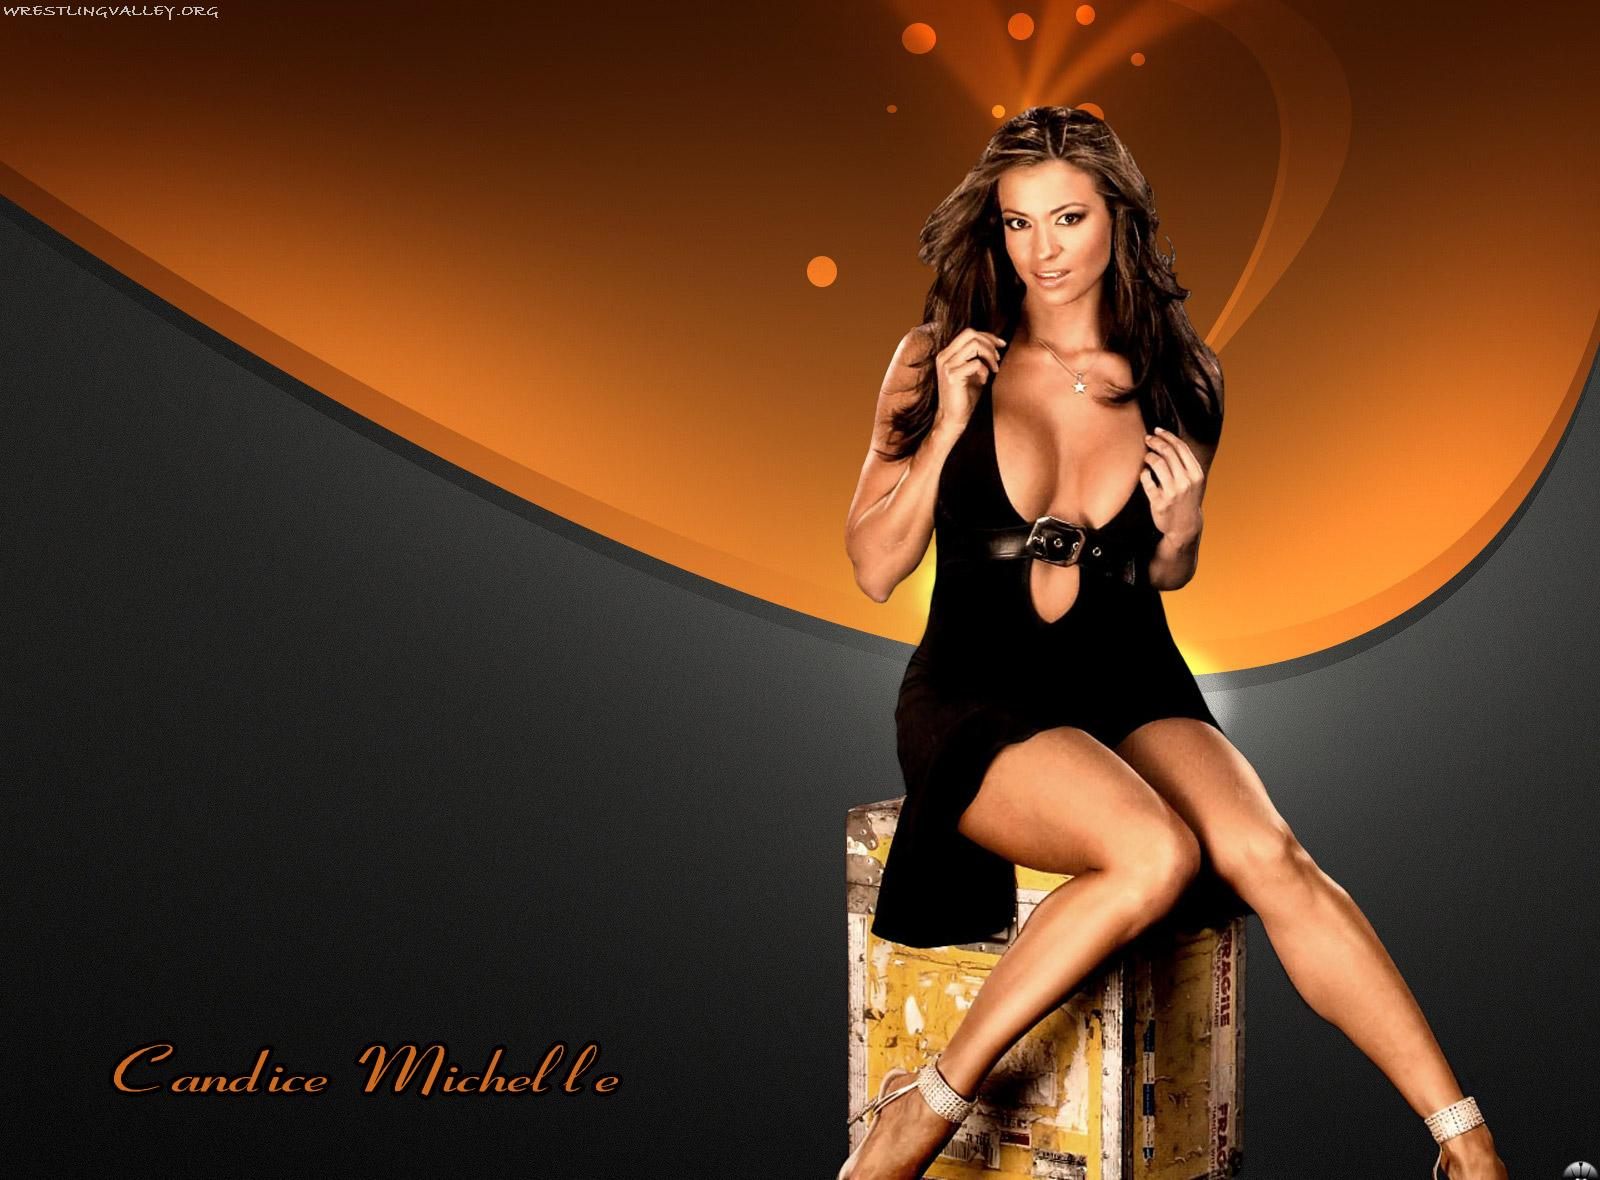 http://2.bp.blogspot.com/-X1jtyKVjxAw/T5qBZQnr2uI/AAAAAAAACpY/LJabeMwfNqg/s1600/candice_michelle_2012+wallpapers+09.jpg